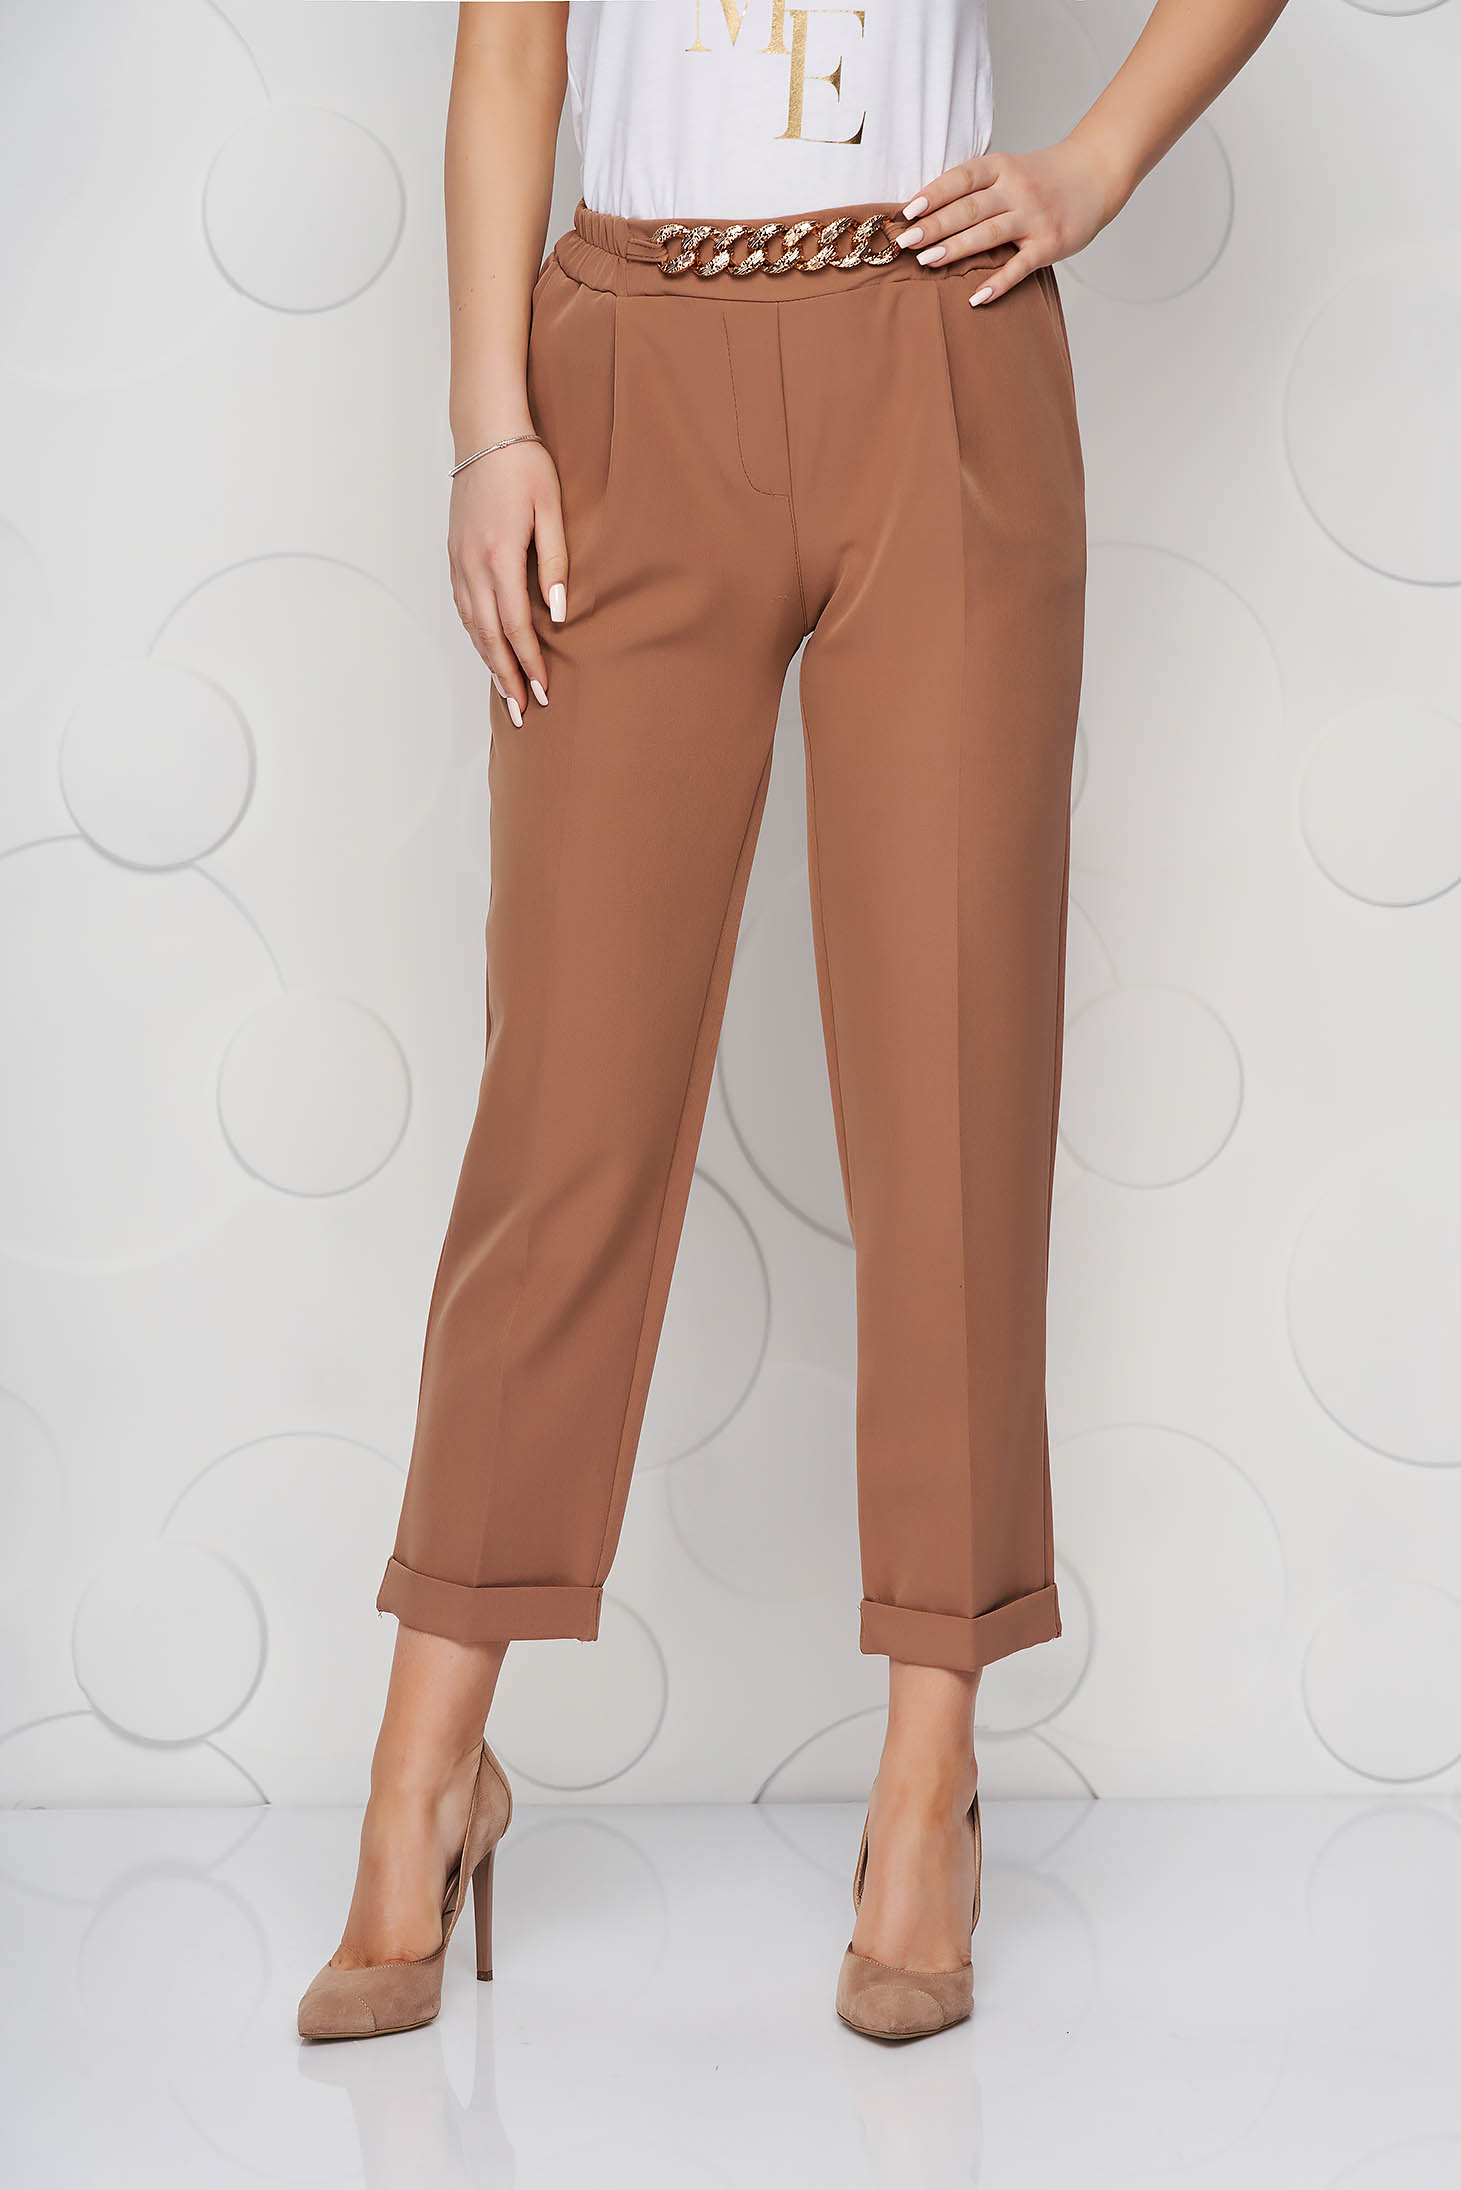 Cappuccino trousers metallic chain accessory loose fit nonelastic fabric